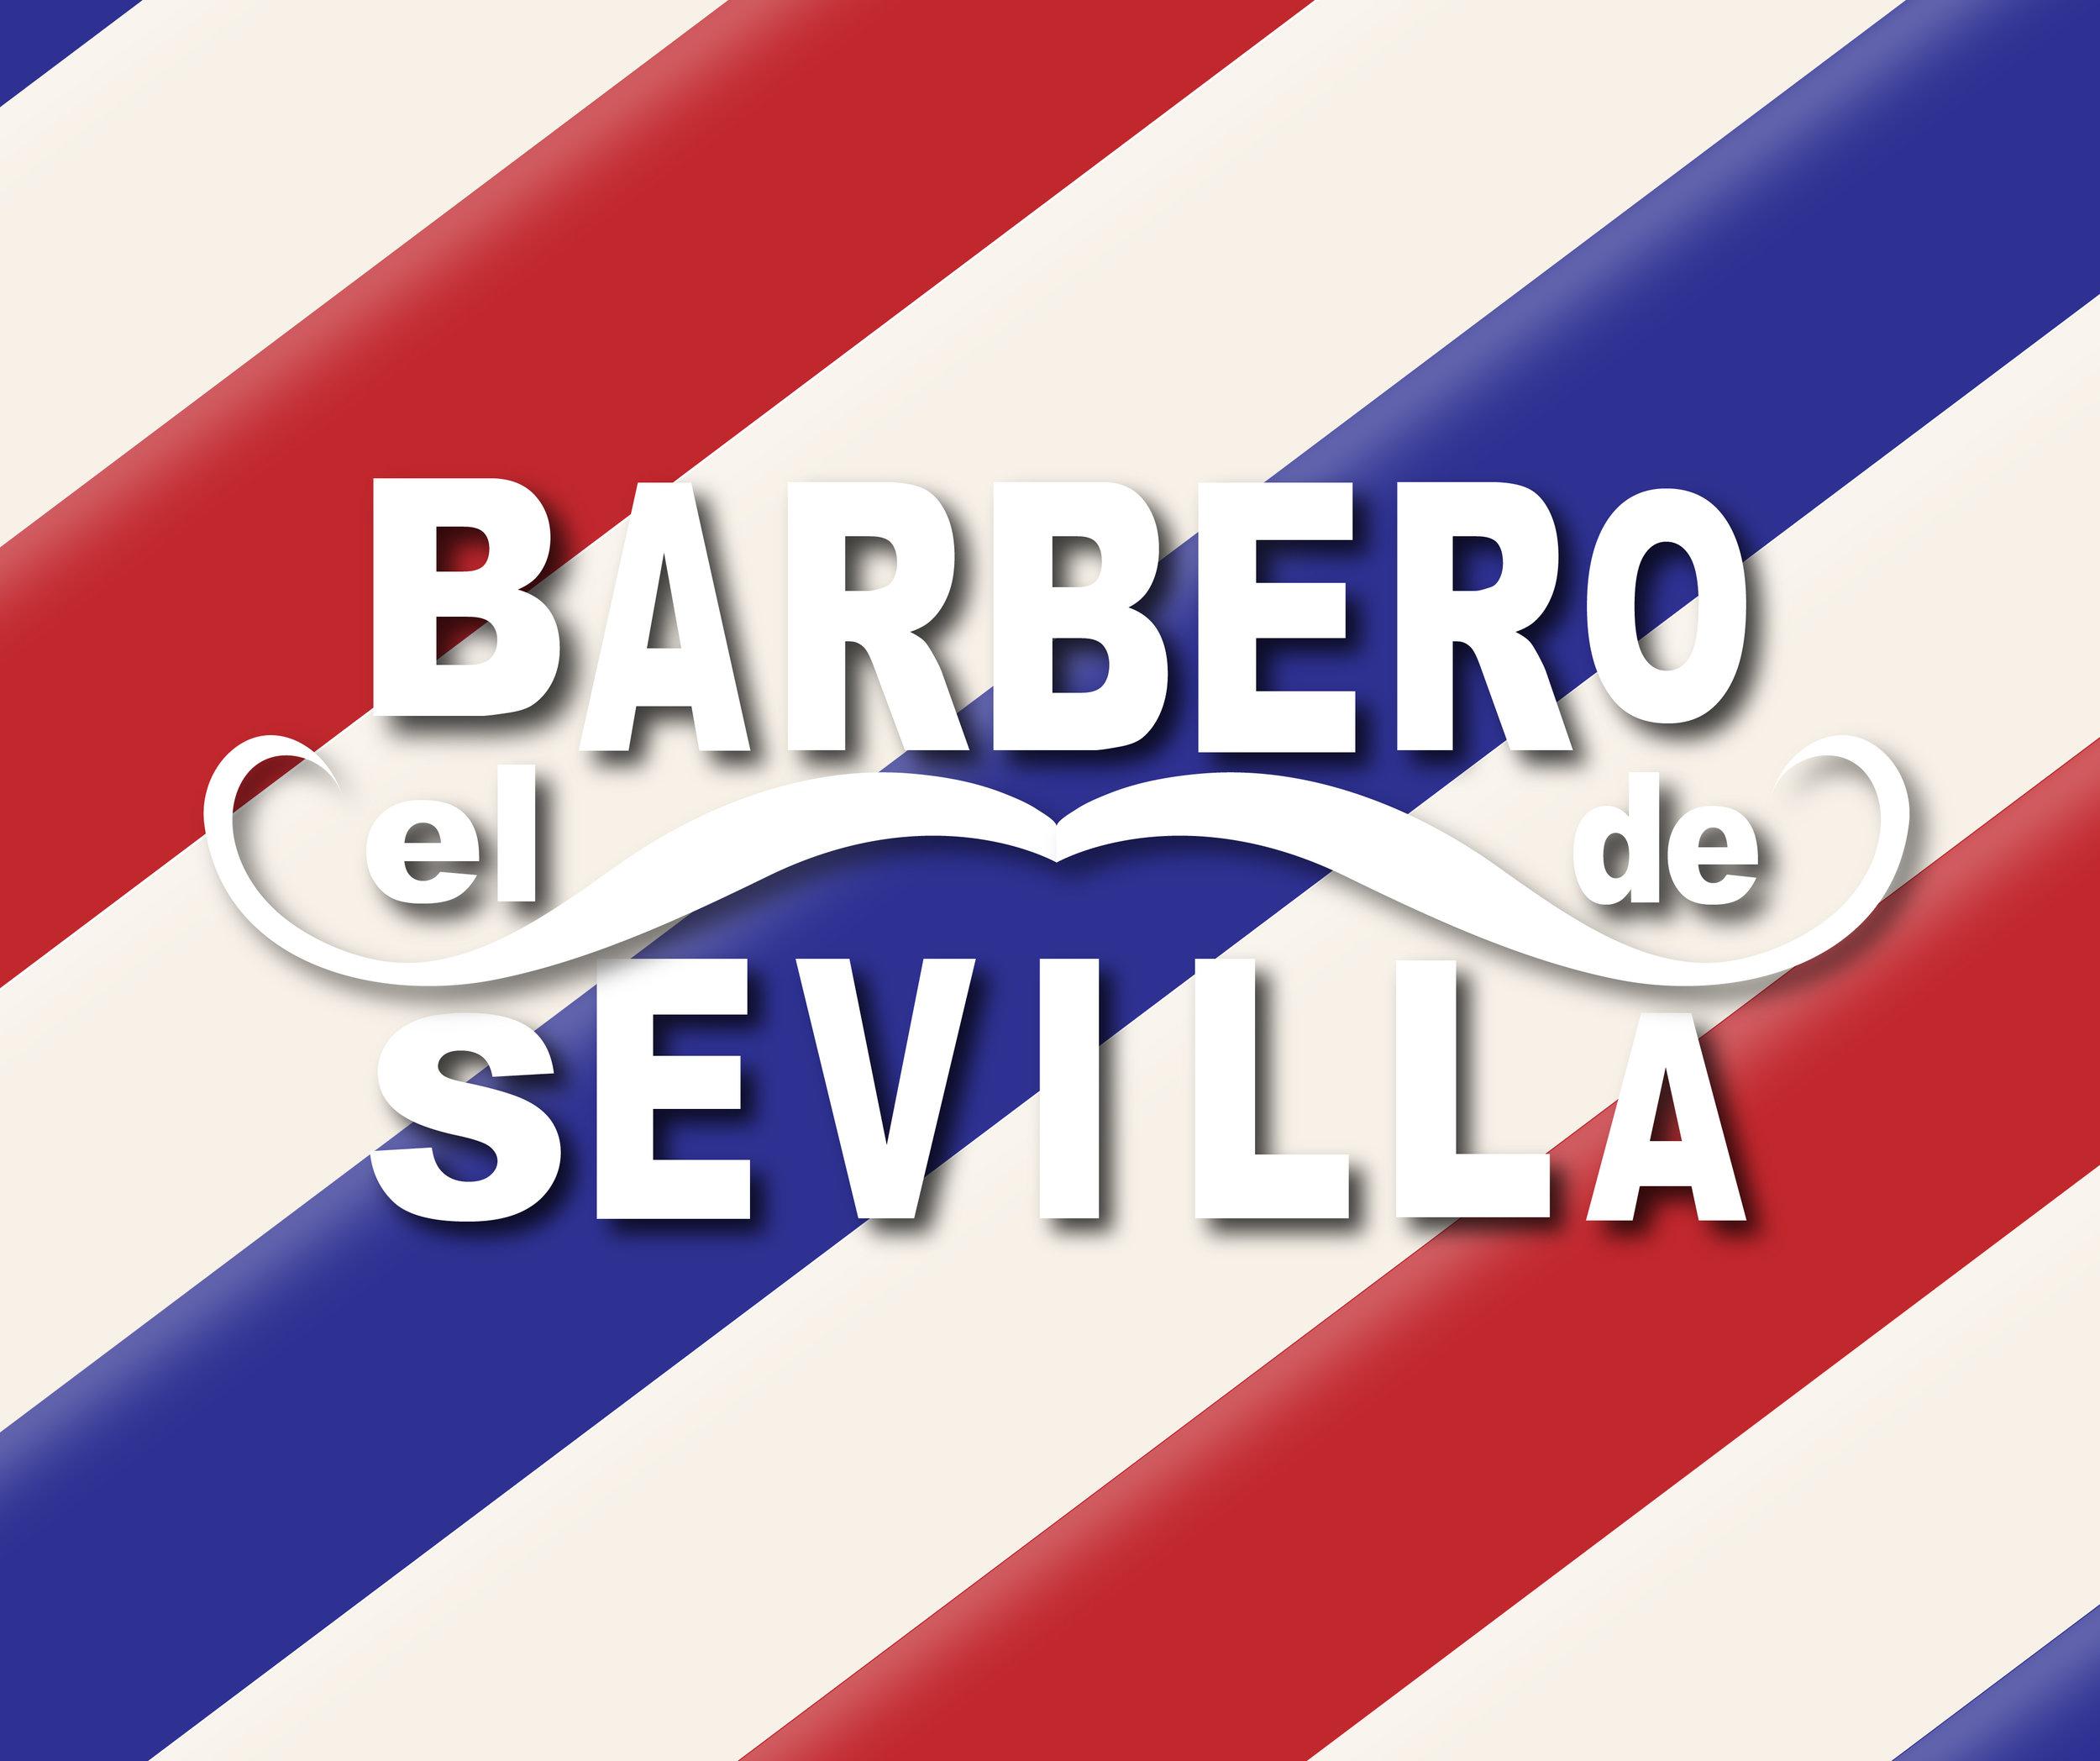 El Barbero Title Card 6-11-19-01.jpg